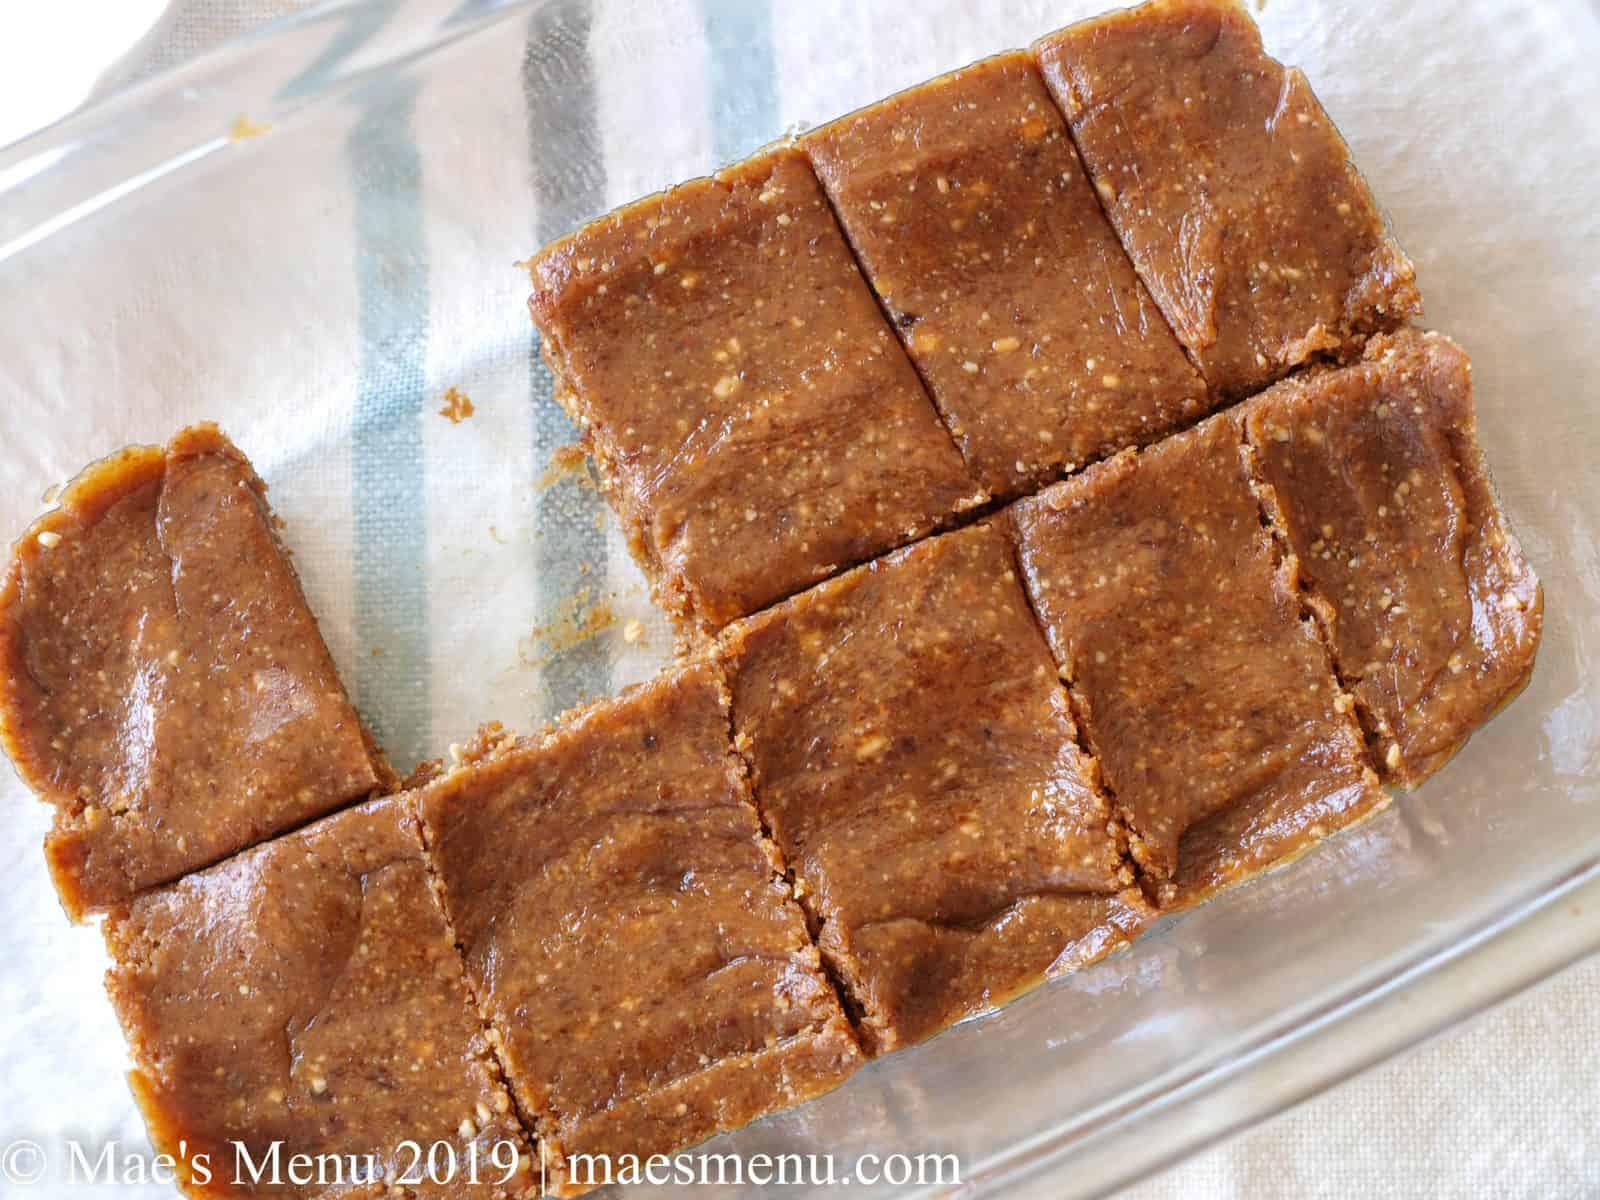 Clear glass pan of a Peanut Butter & Larabar recipe cut into pieces.